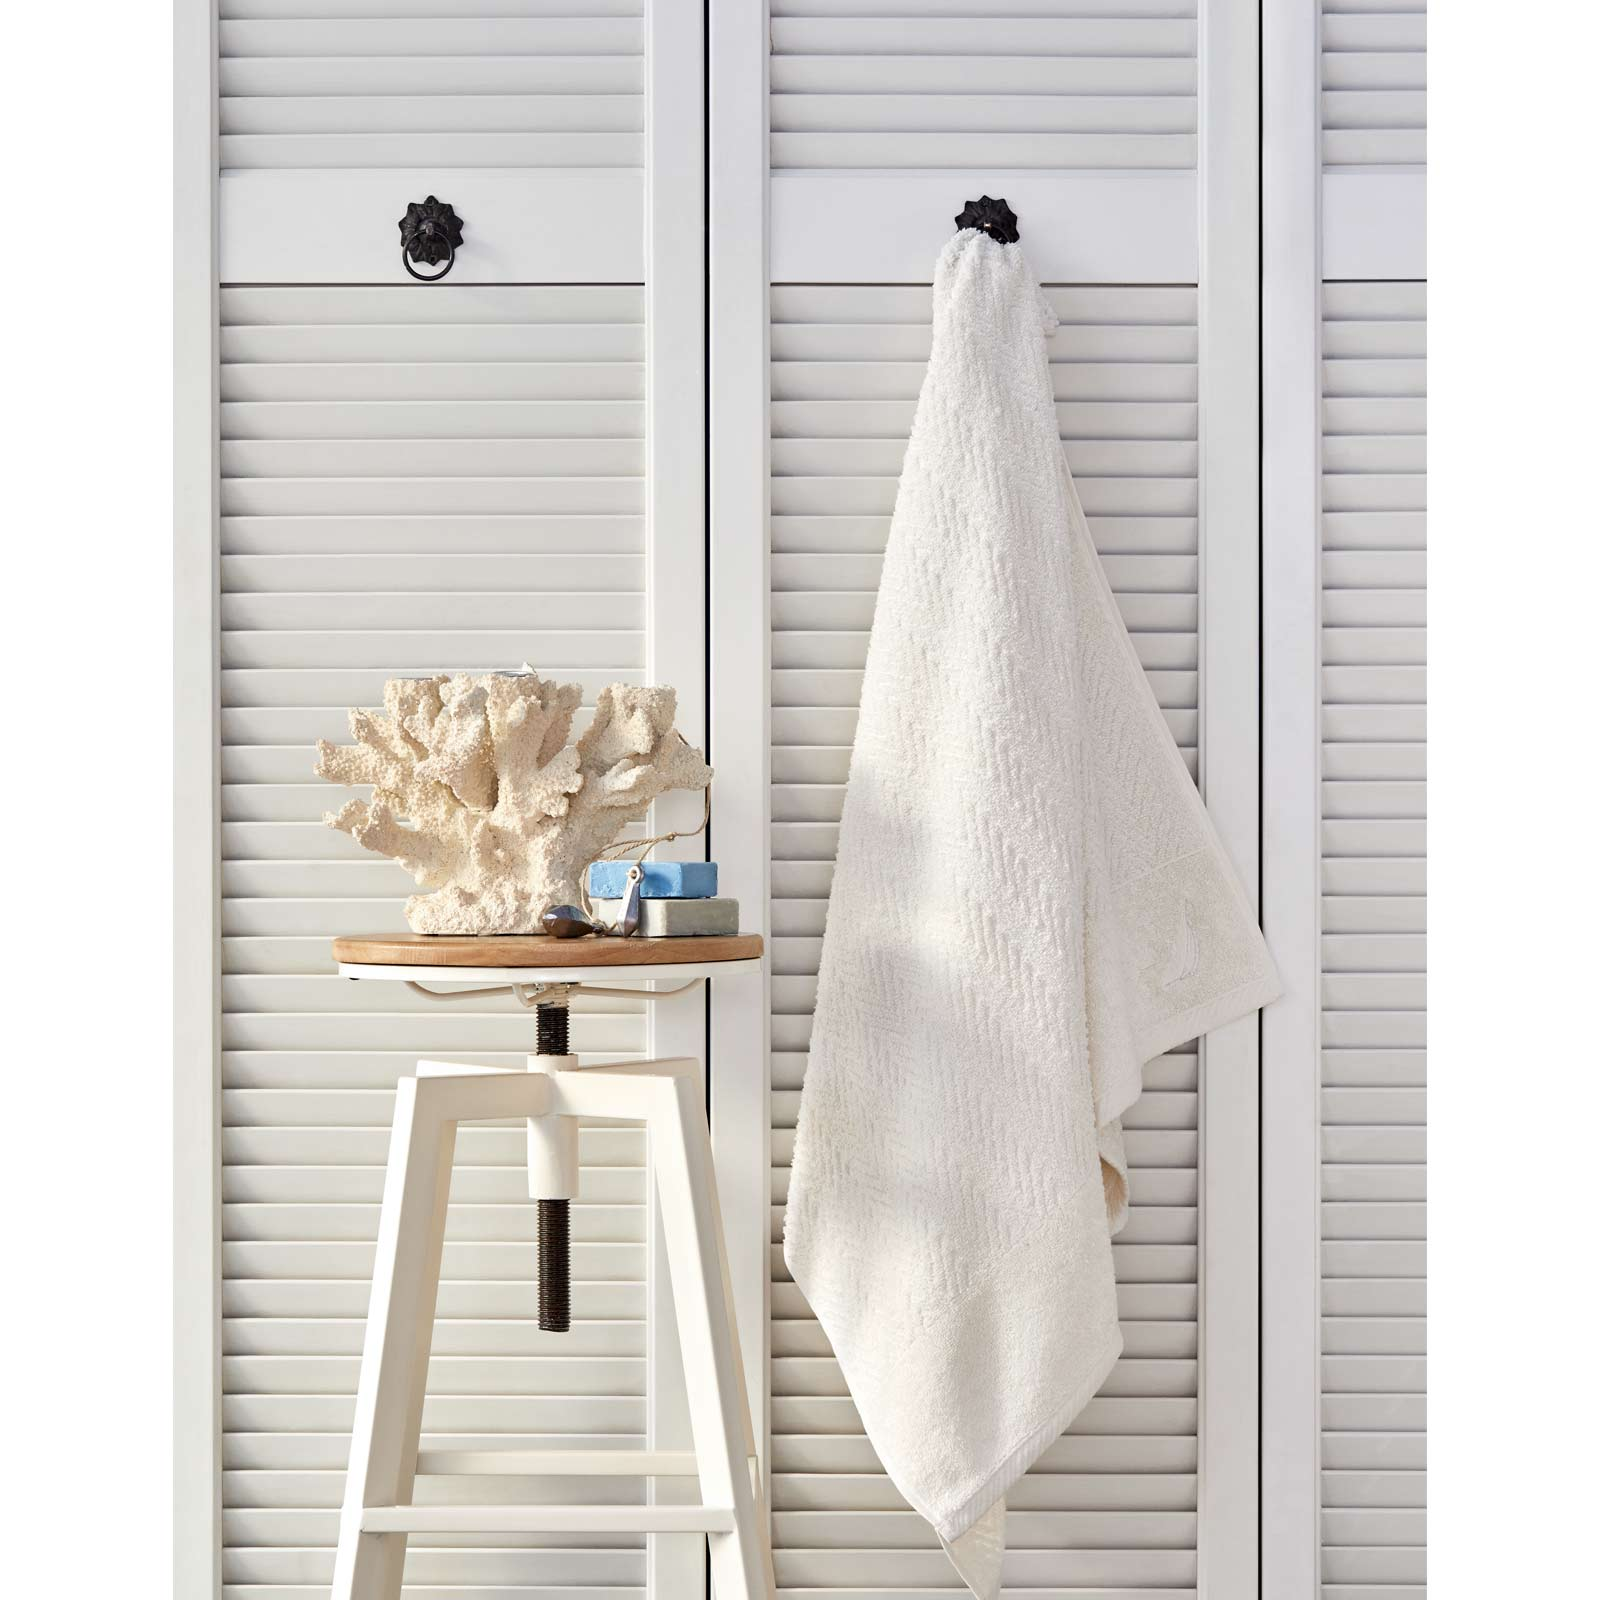 Nautica Home Zigzag 70x140 cm Beyaz Banyo Havlusu